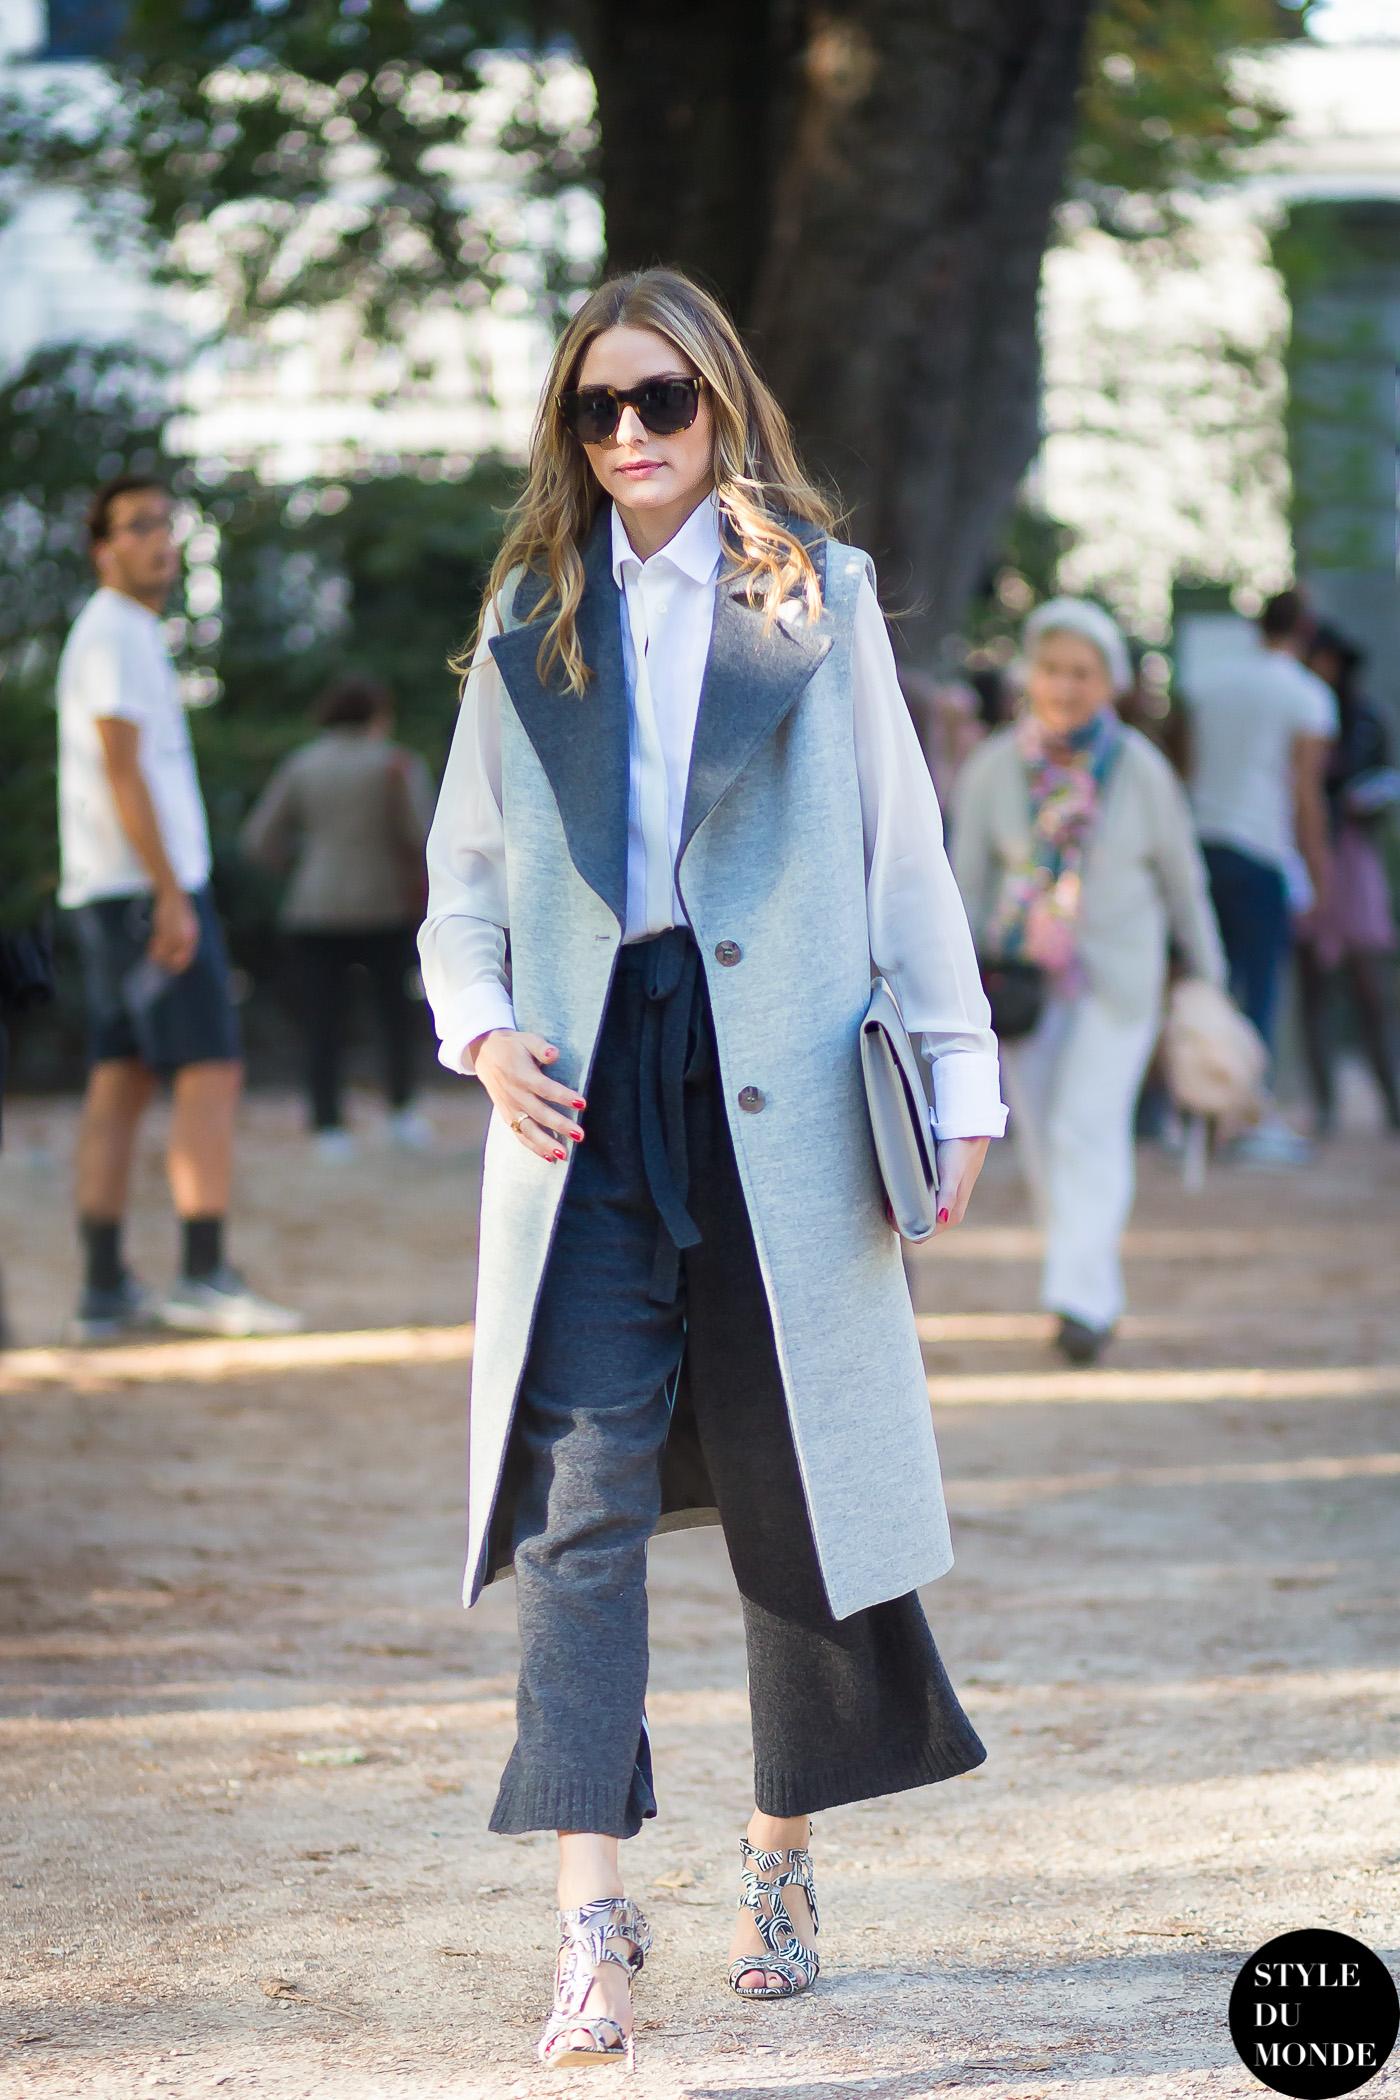 Olivia Palermo - 2/2 - STYLE DU MONDE | Street Style